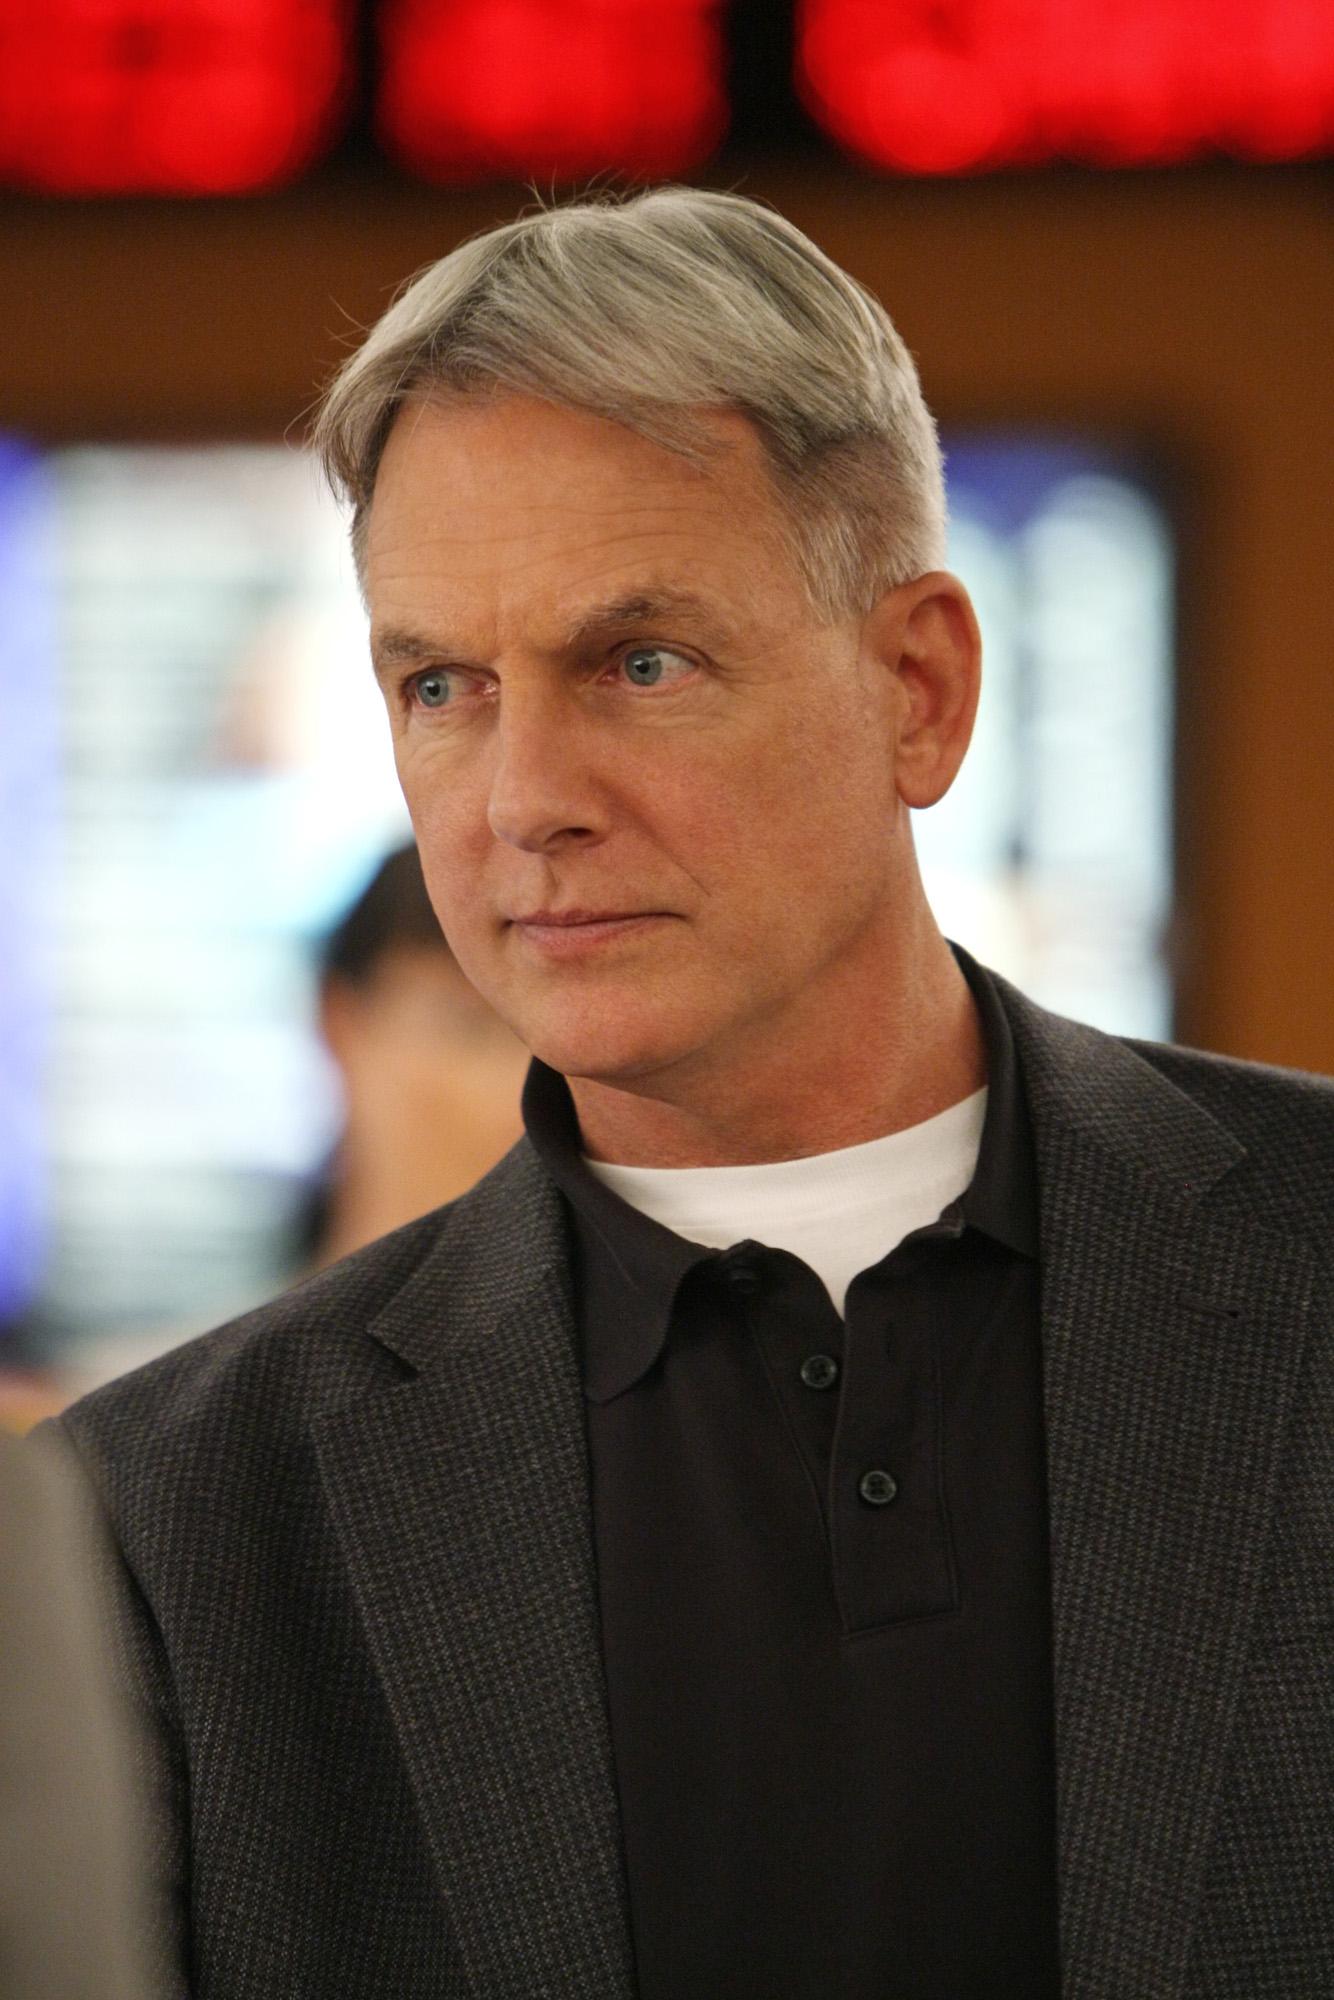 Gibbs' Look